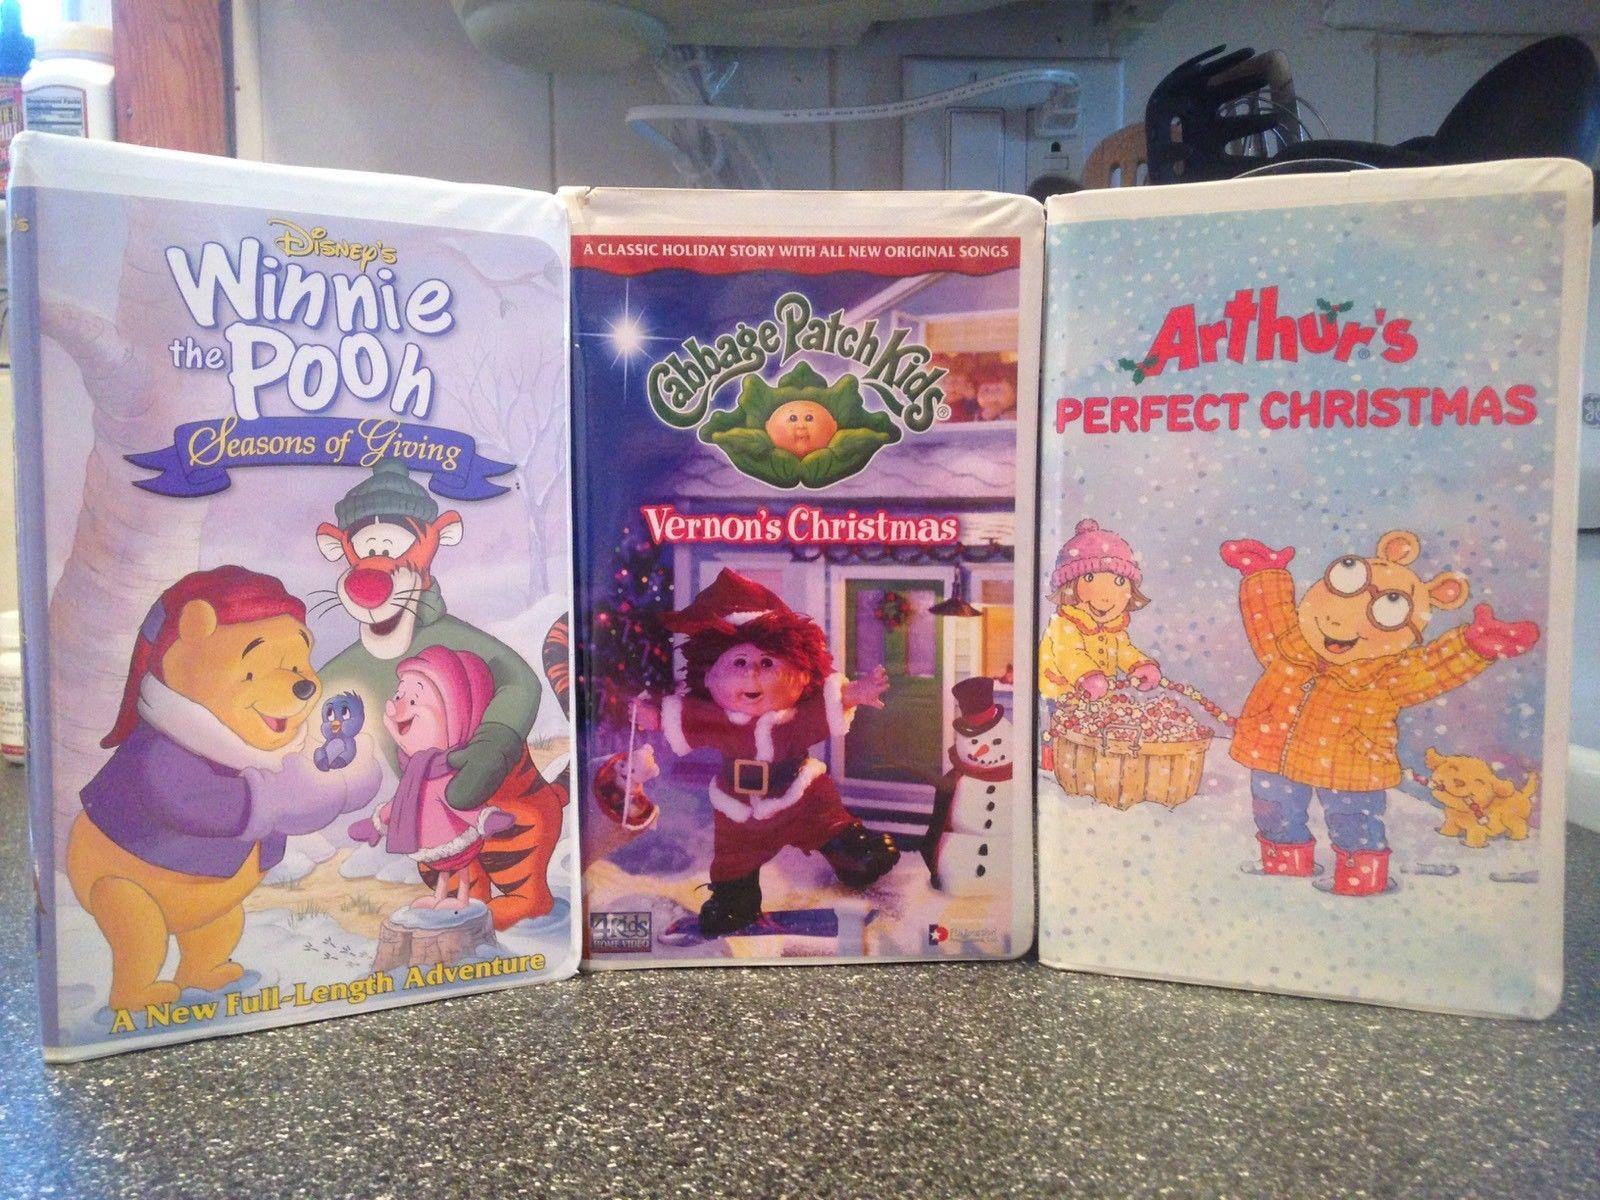 Arthurs Perfect Christmas.Winnie The Pooh Seasons Of Givings Arthur S And 16 Similar Items